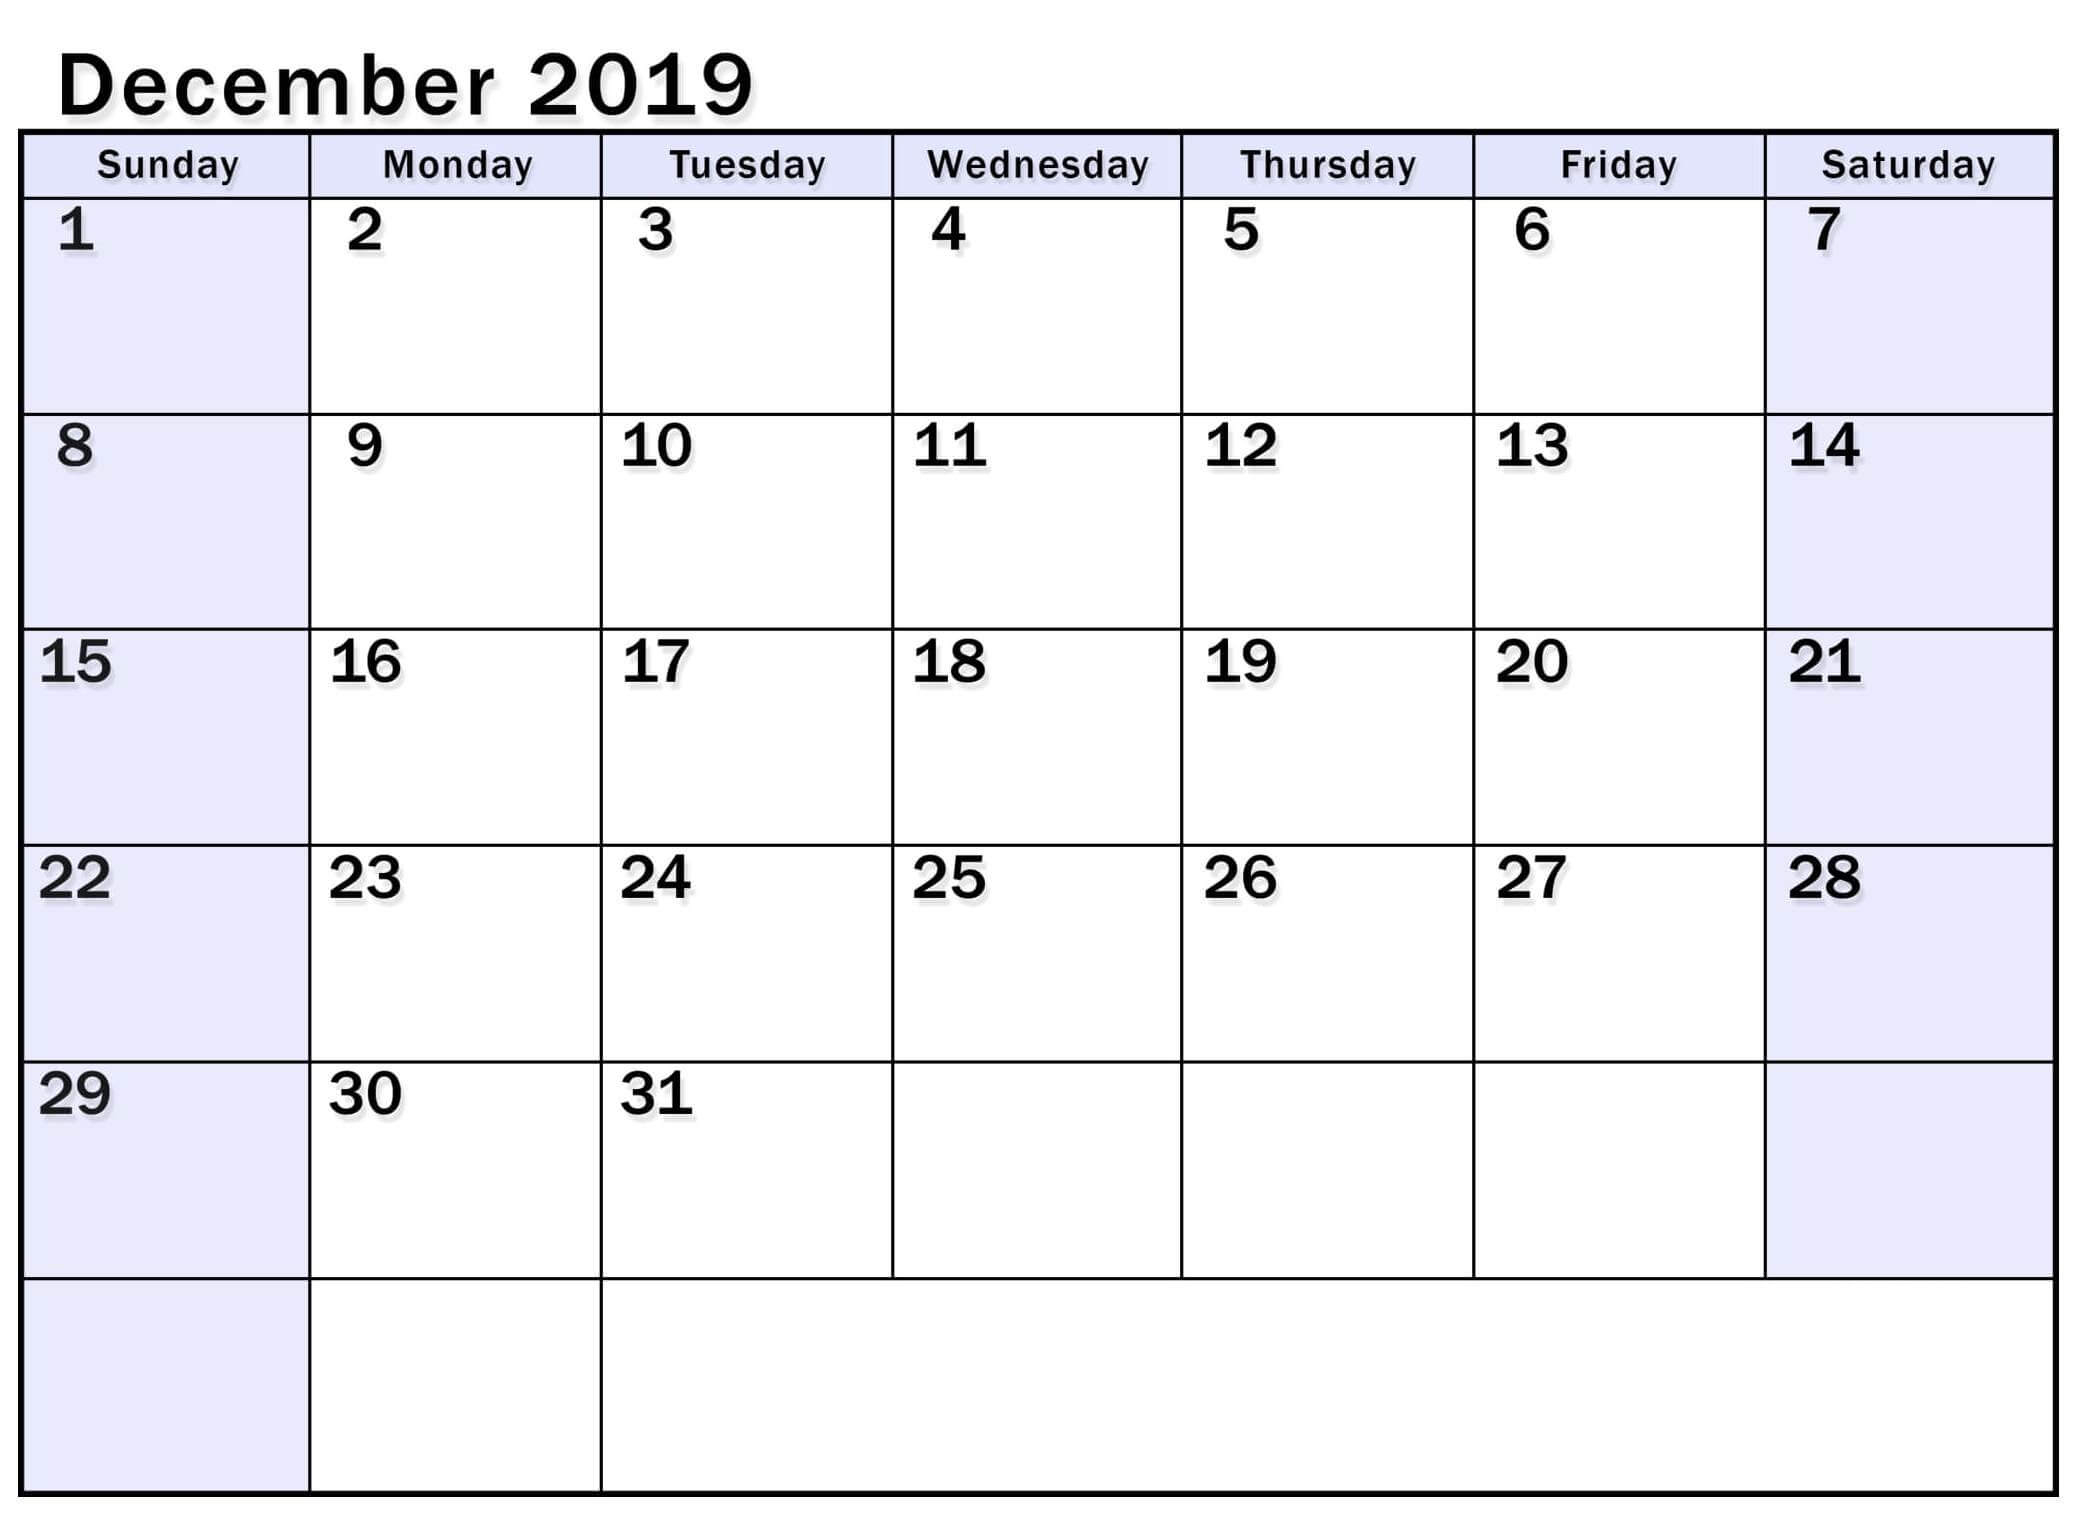 Free Printable Calendar For December 2019 - 2019 Calendars